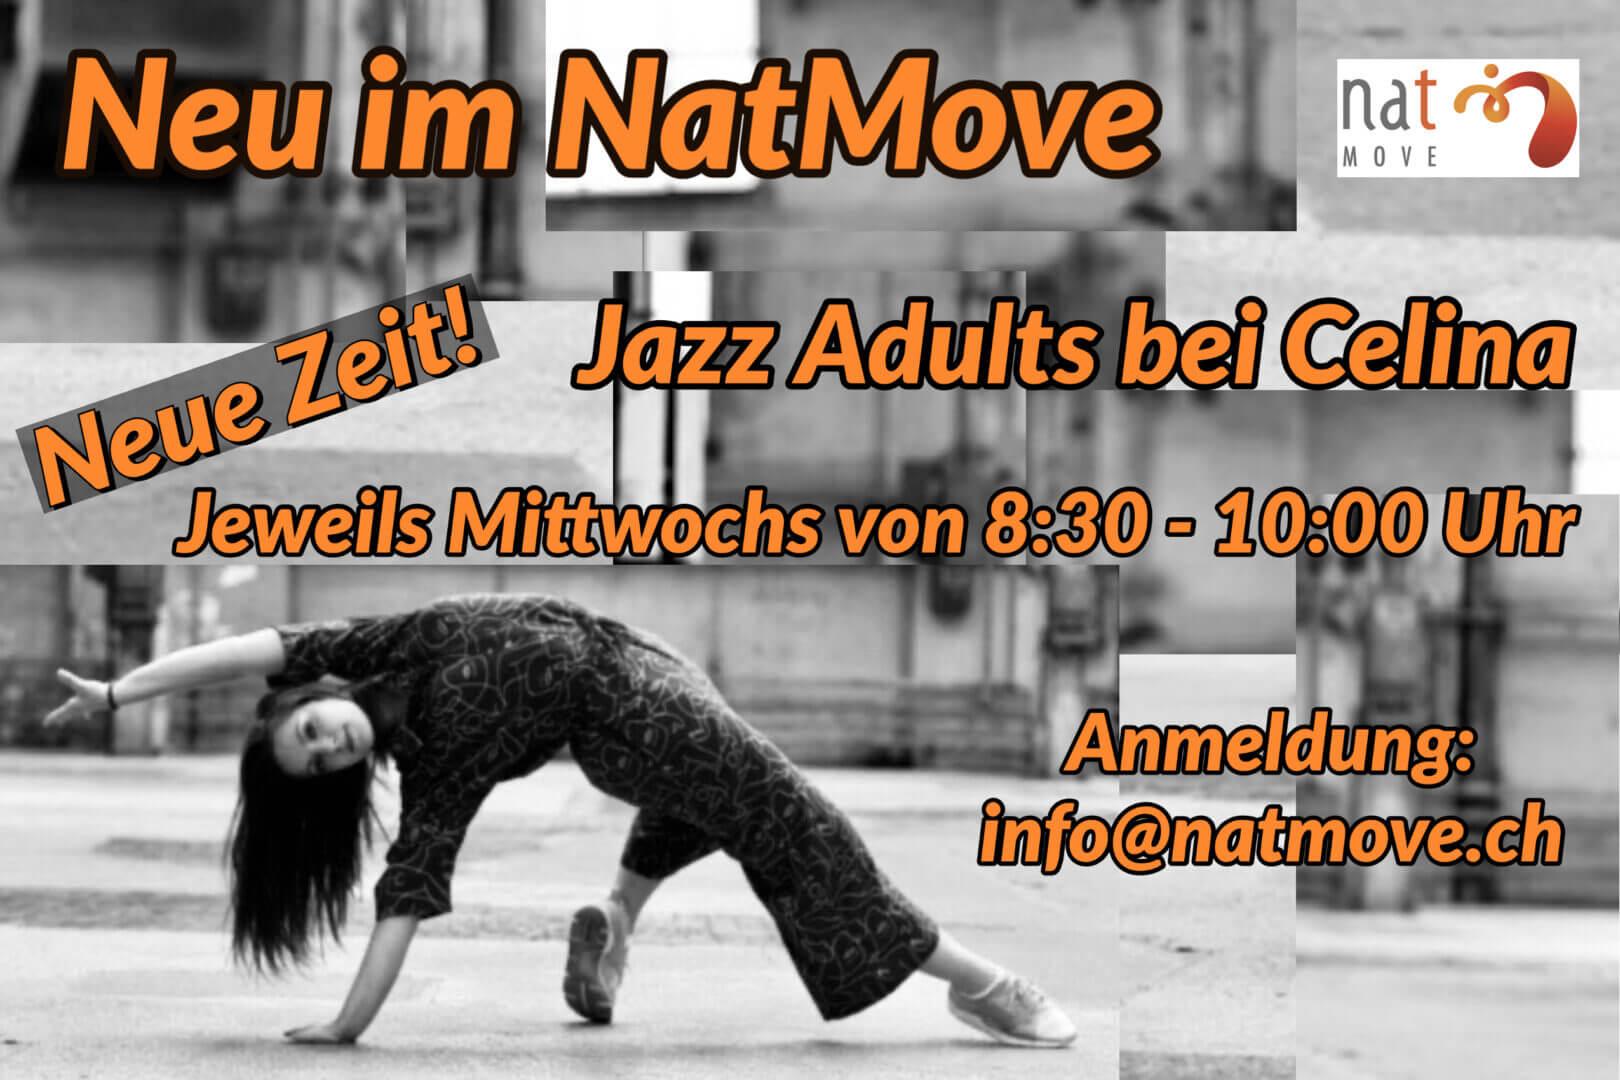 Celina Jazz NewNeueZeitNatMove